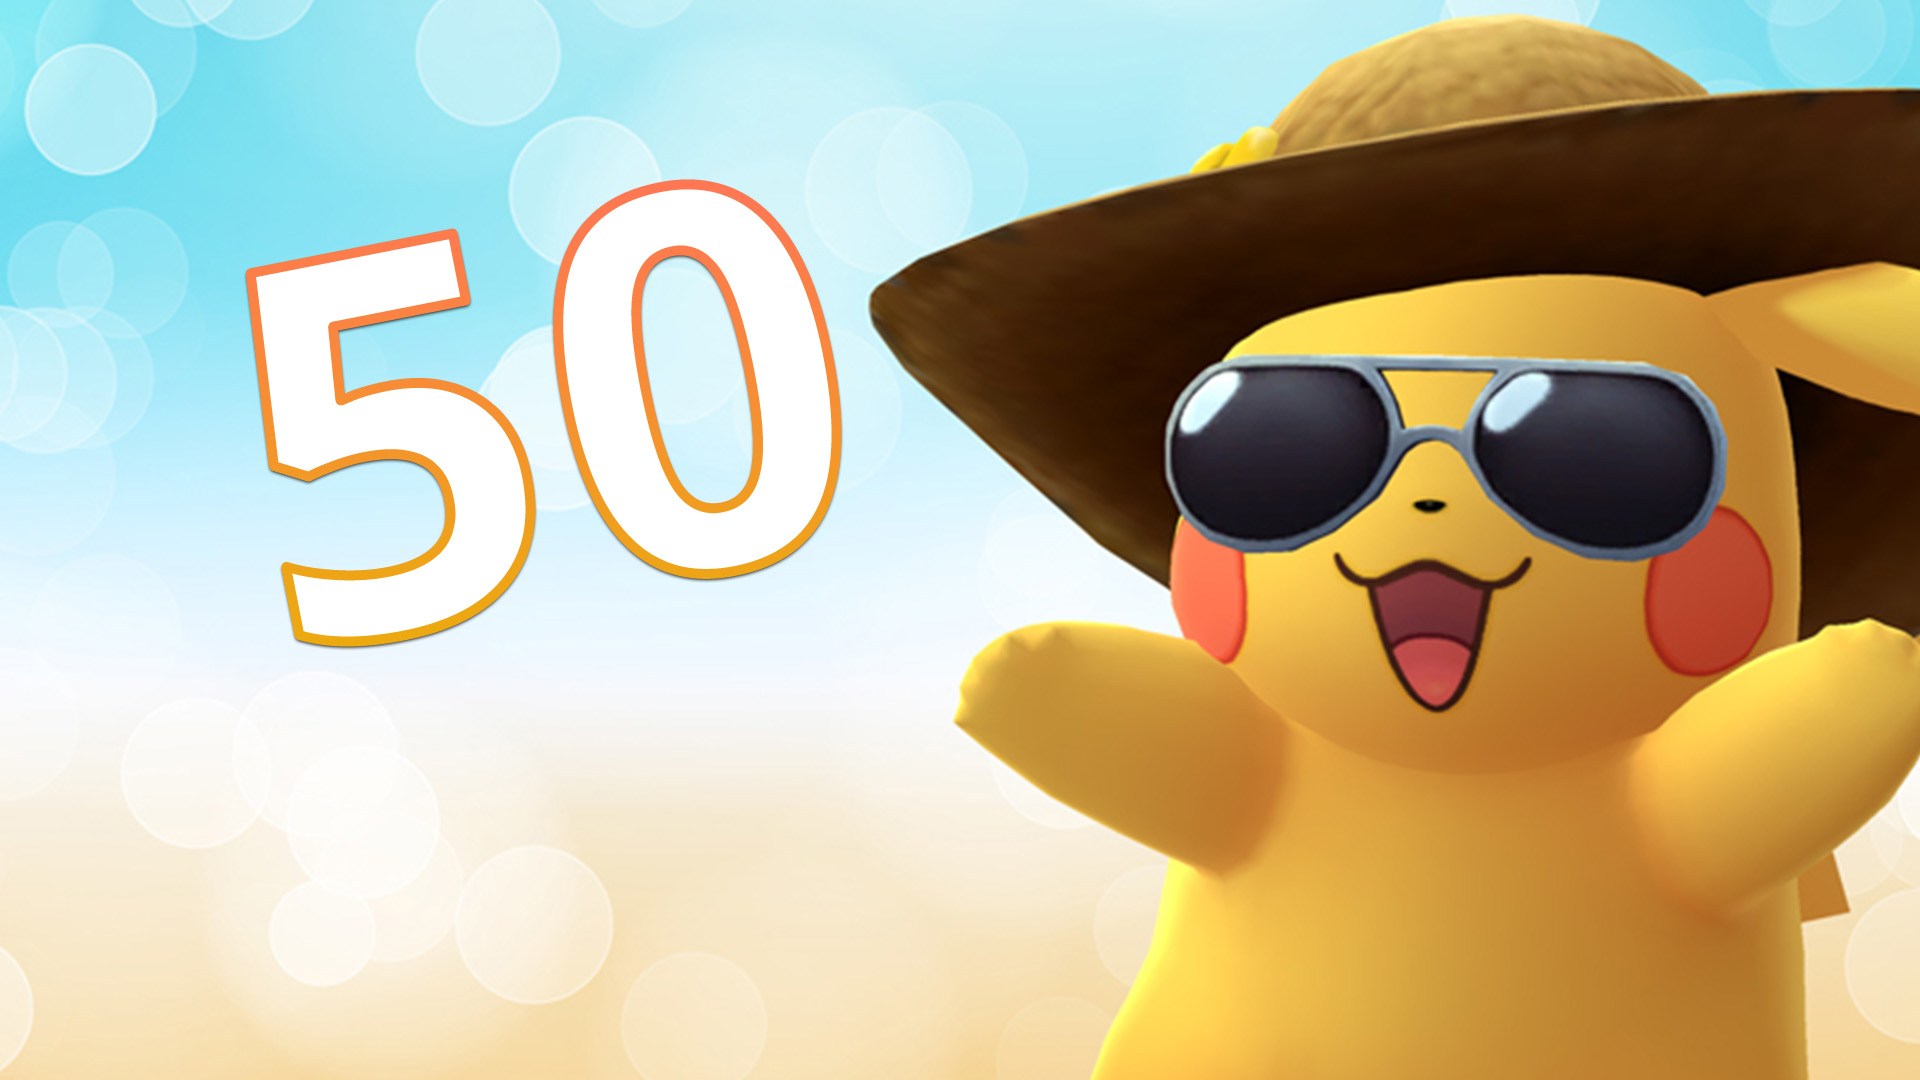 Pokémon GO Level 50 Titel